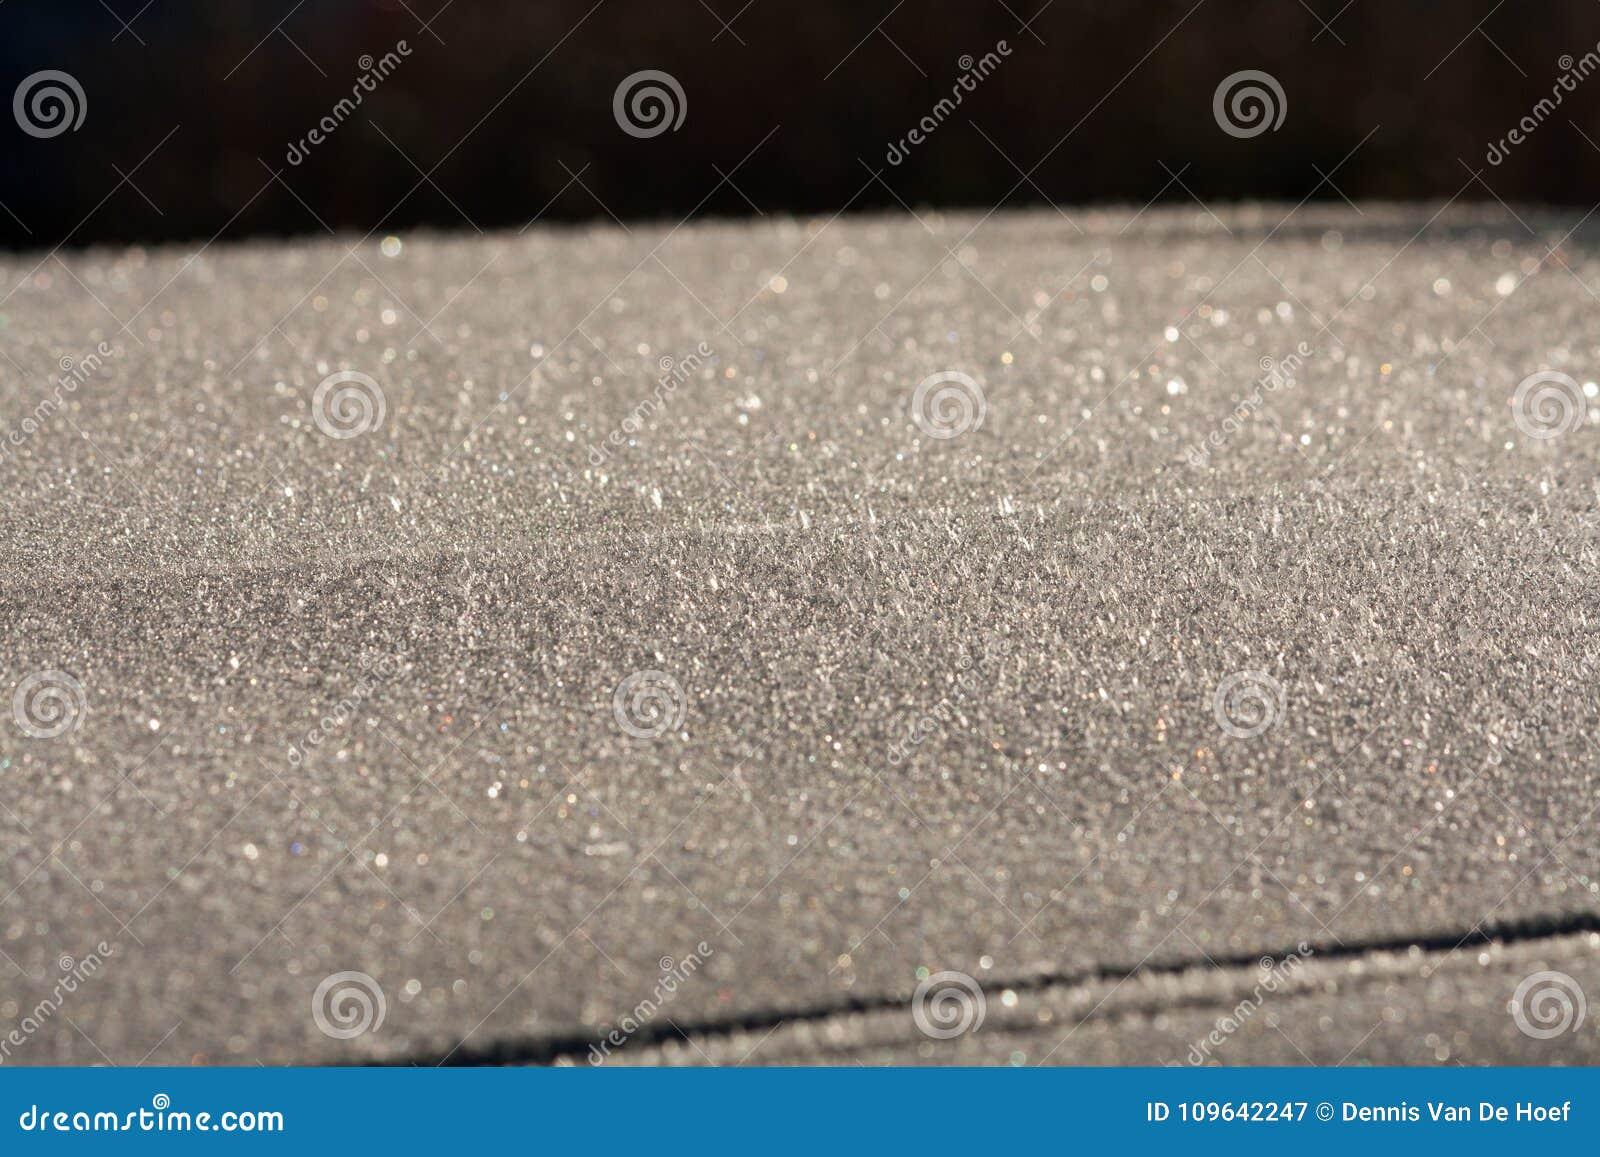 Frozen car roof.